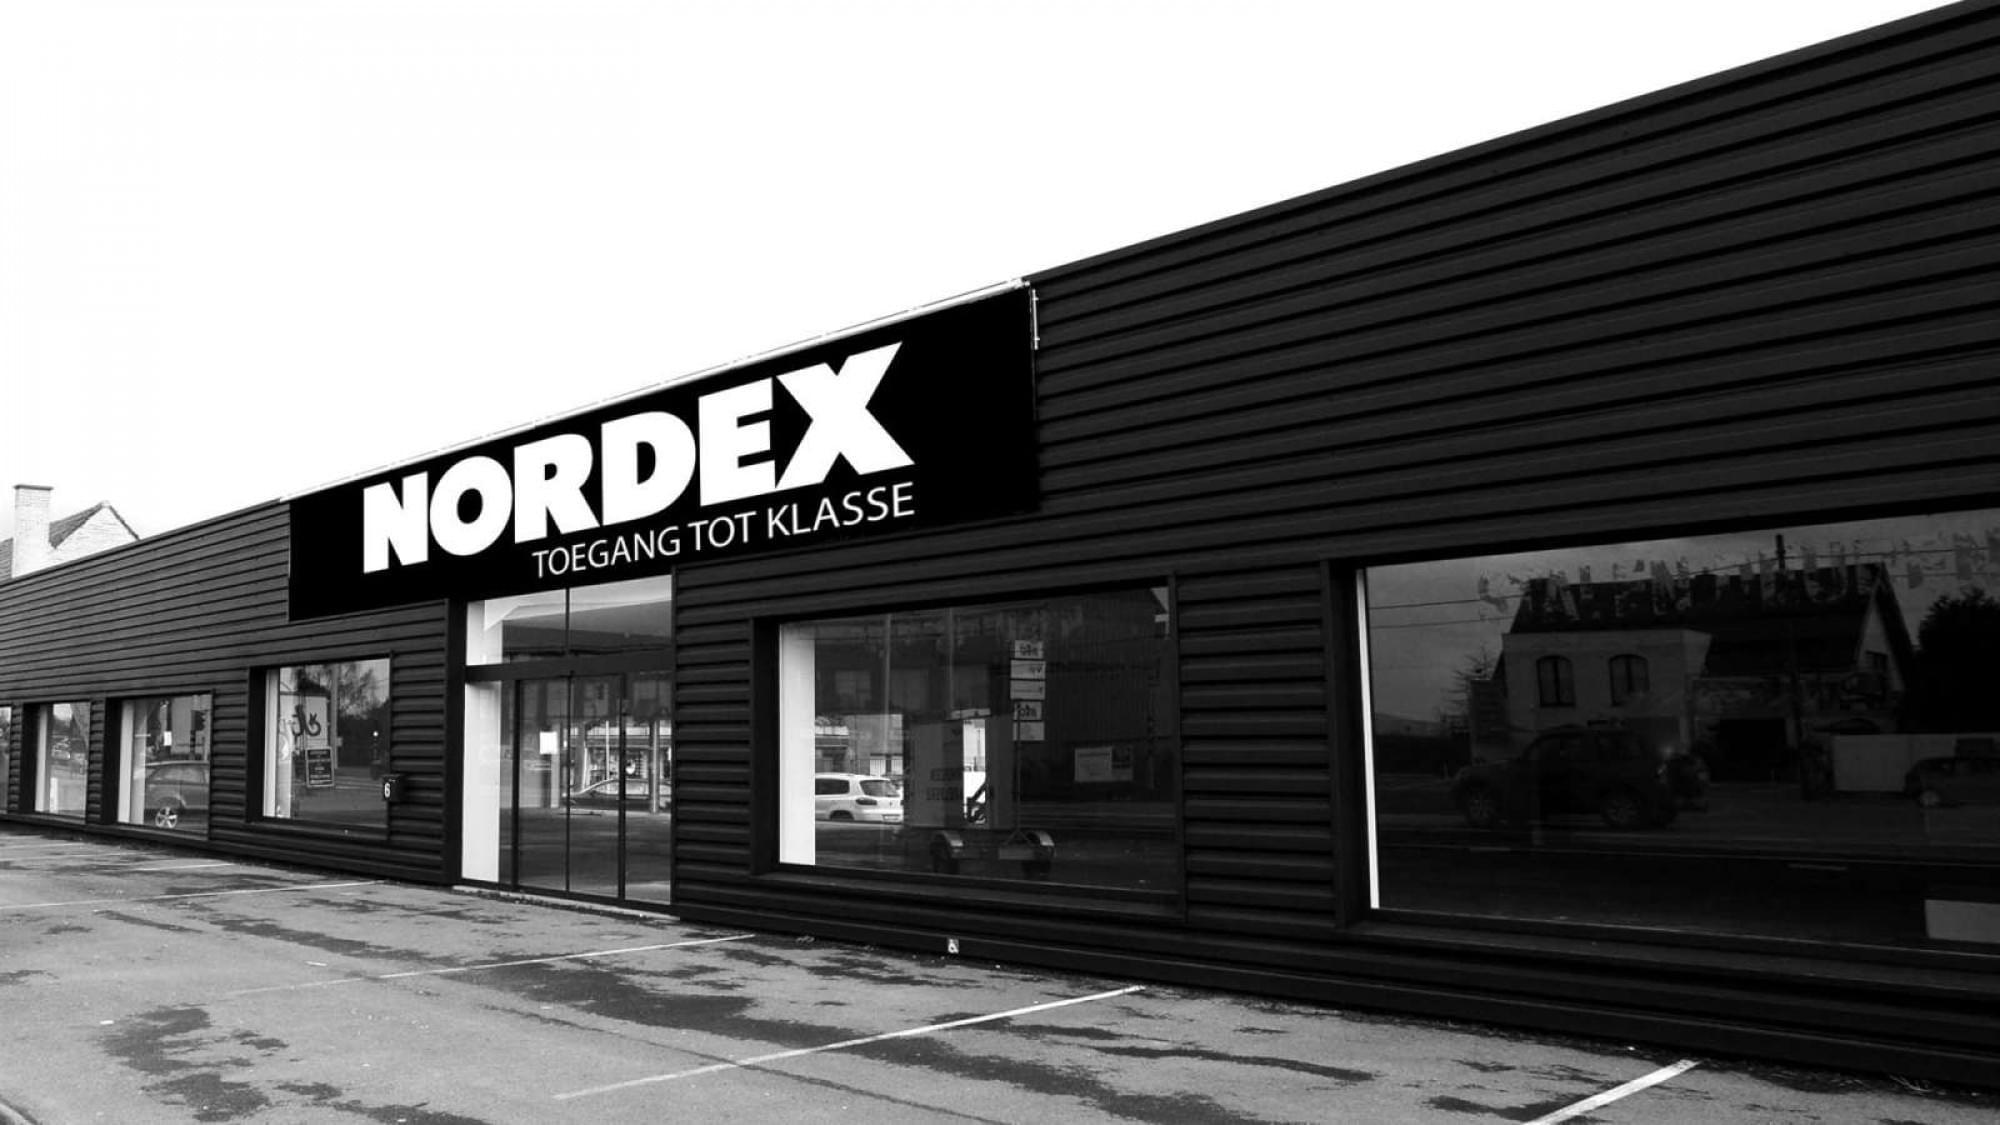 4883-nordex-aalter-childxl